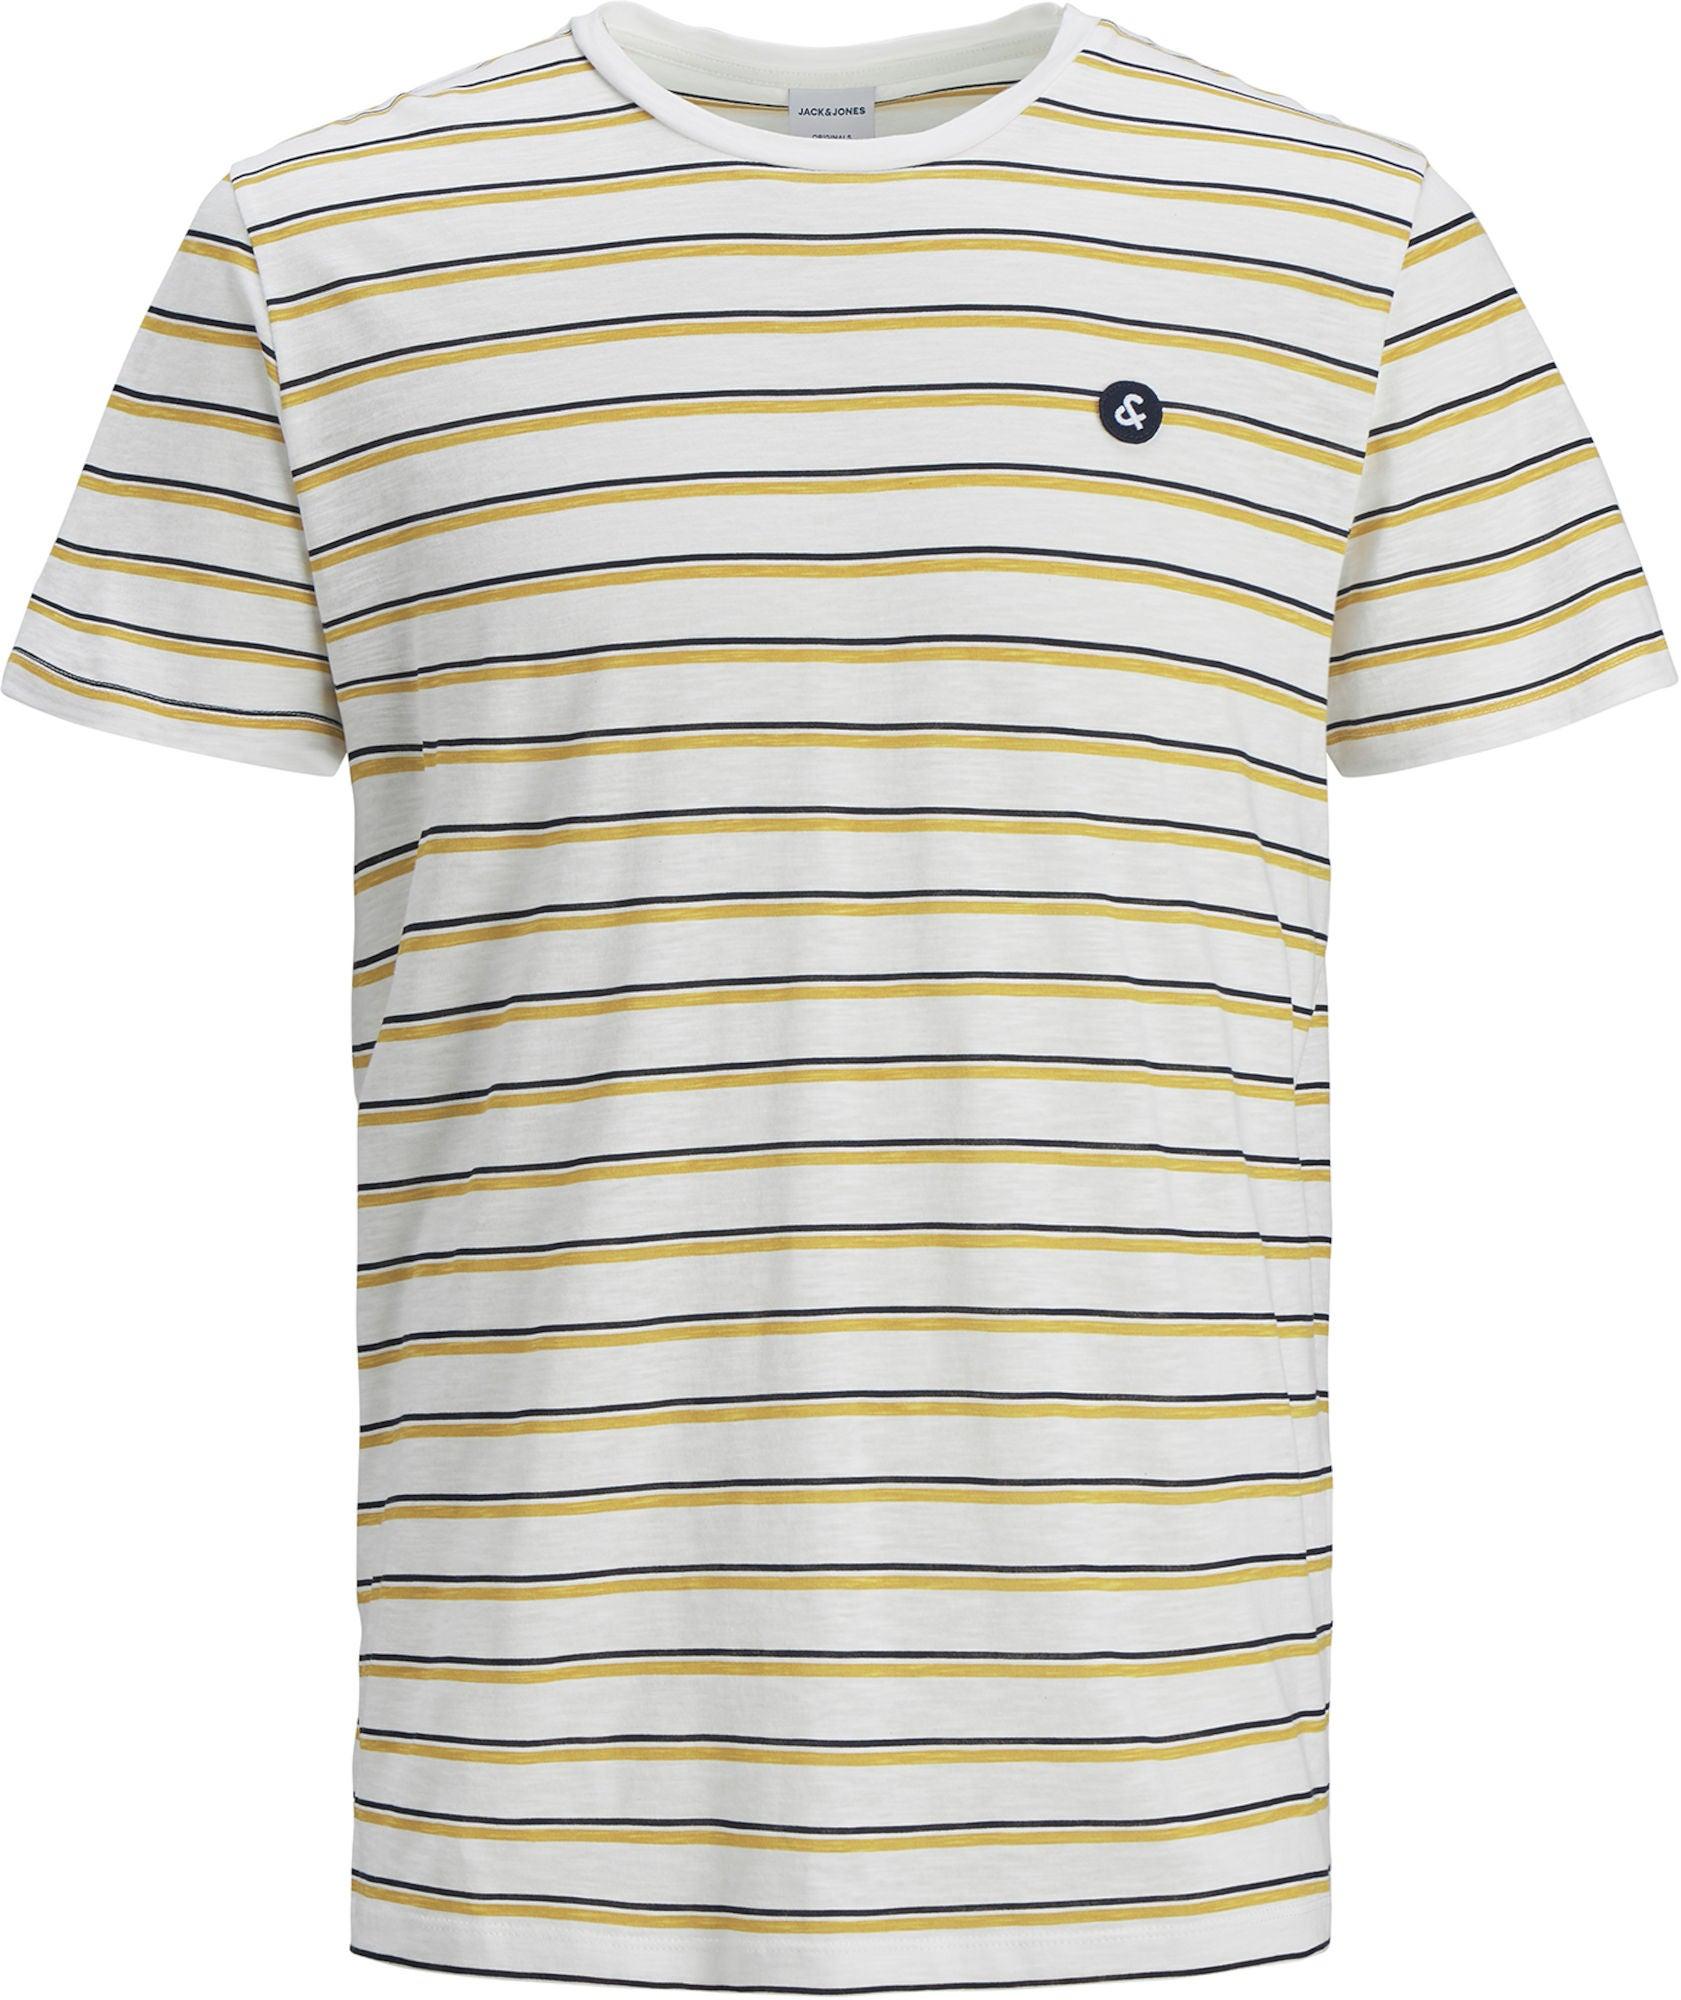 Jack & Jones Stanford T-Shirt, Cloud Dancer 140